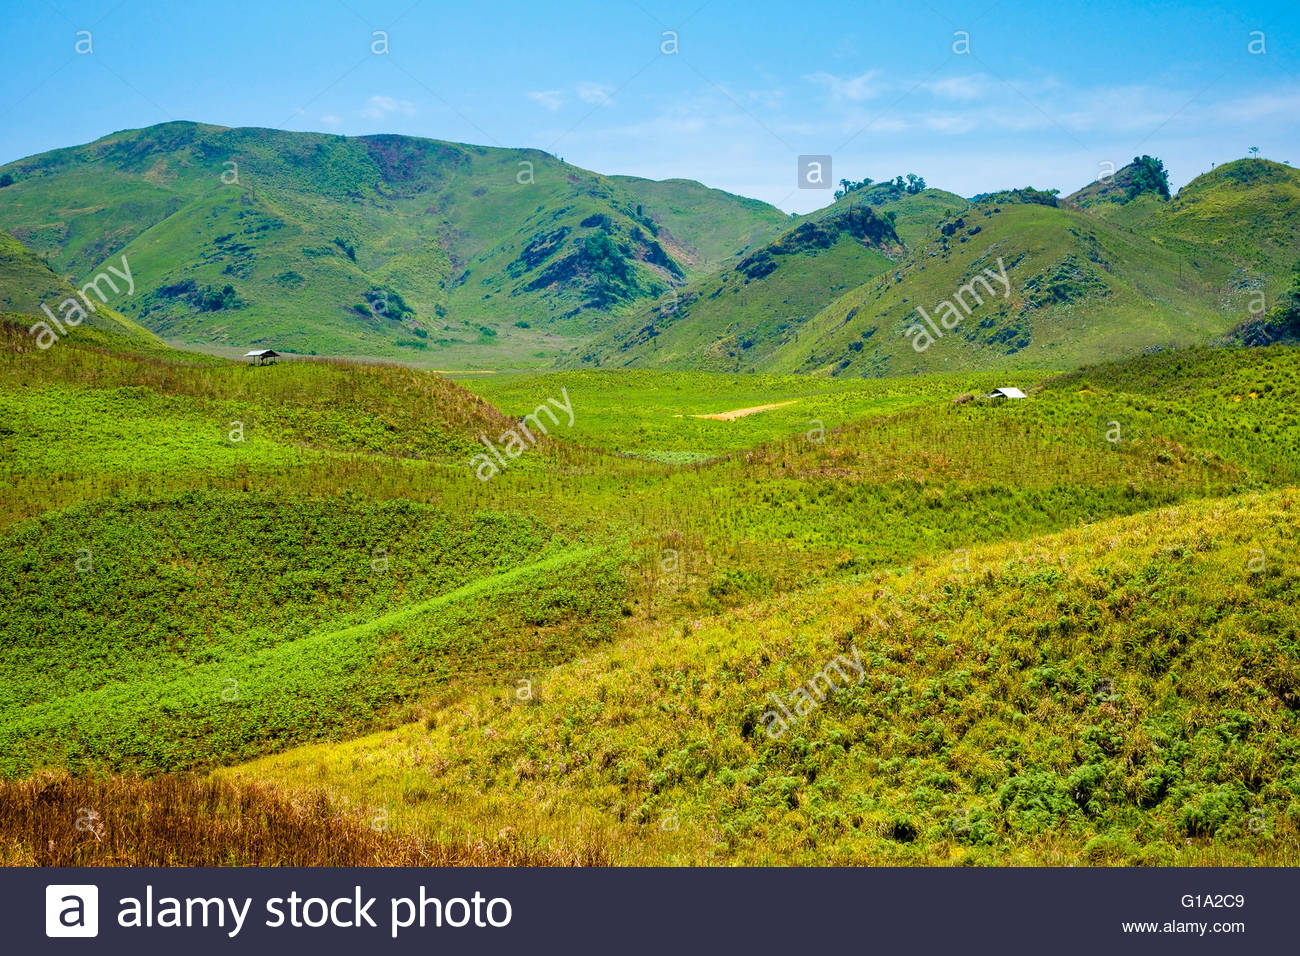 Üppig grüne Landschaft, Louangphabang Provinz, Laos Stockbild